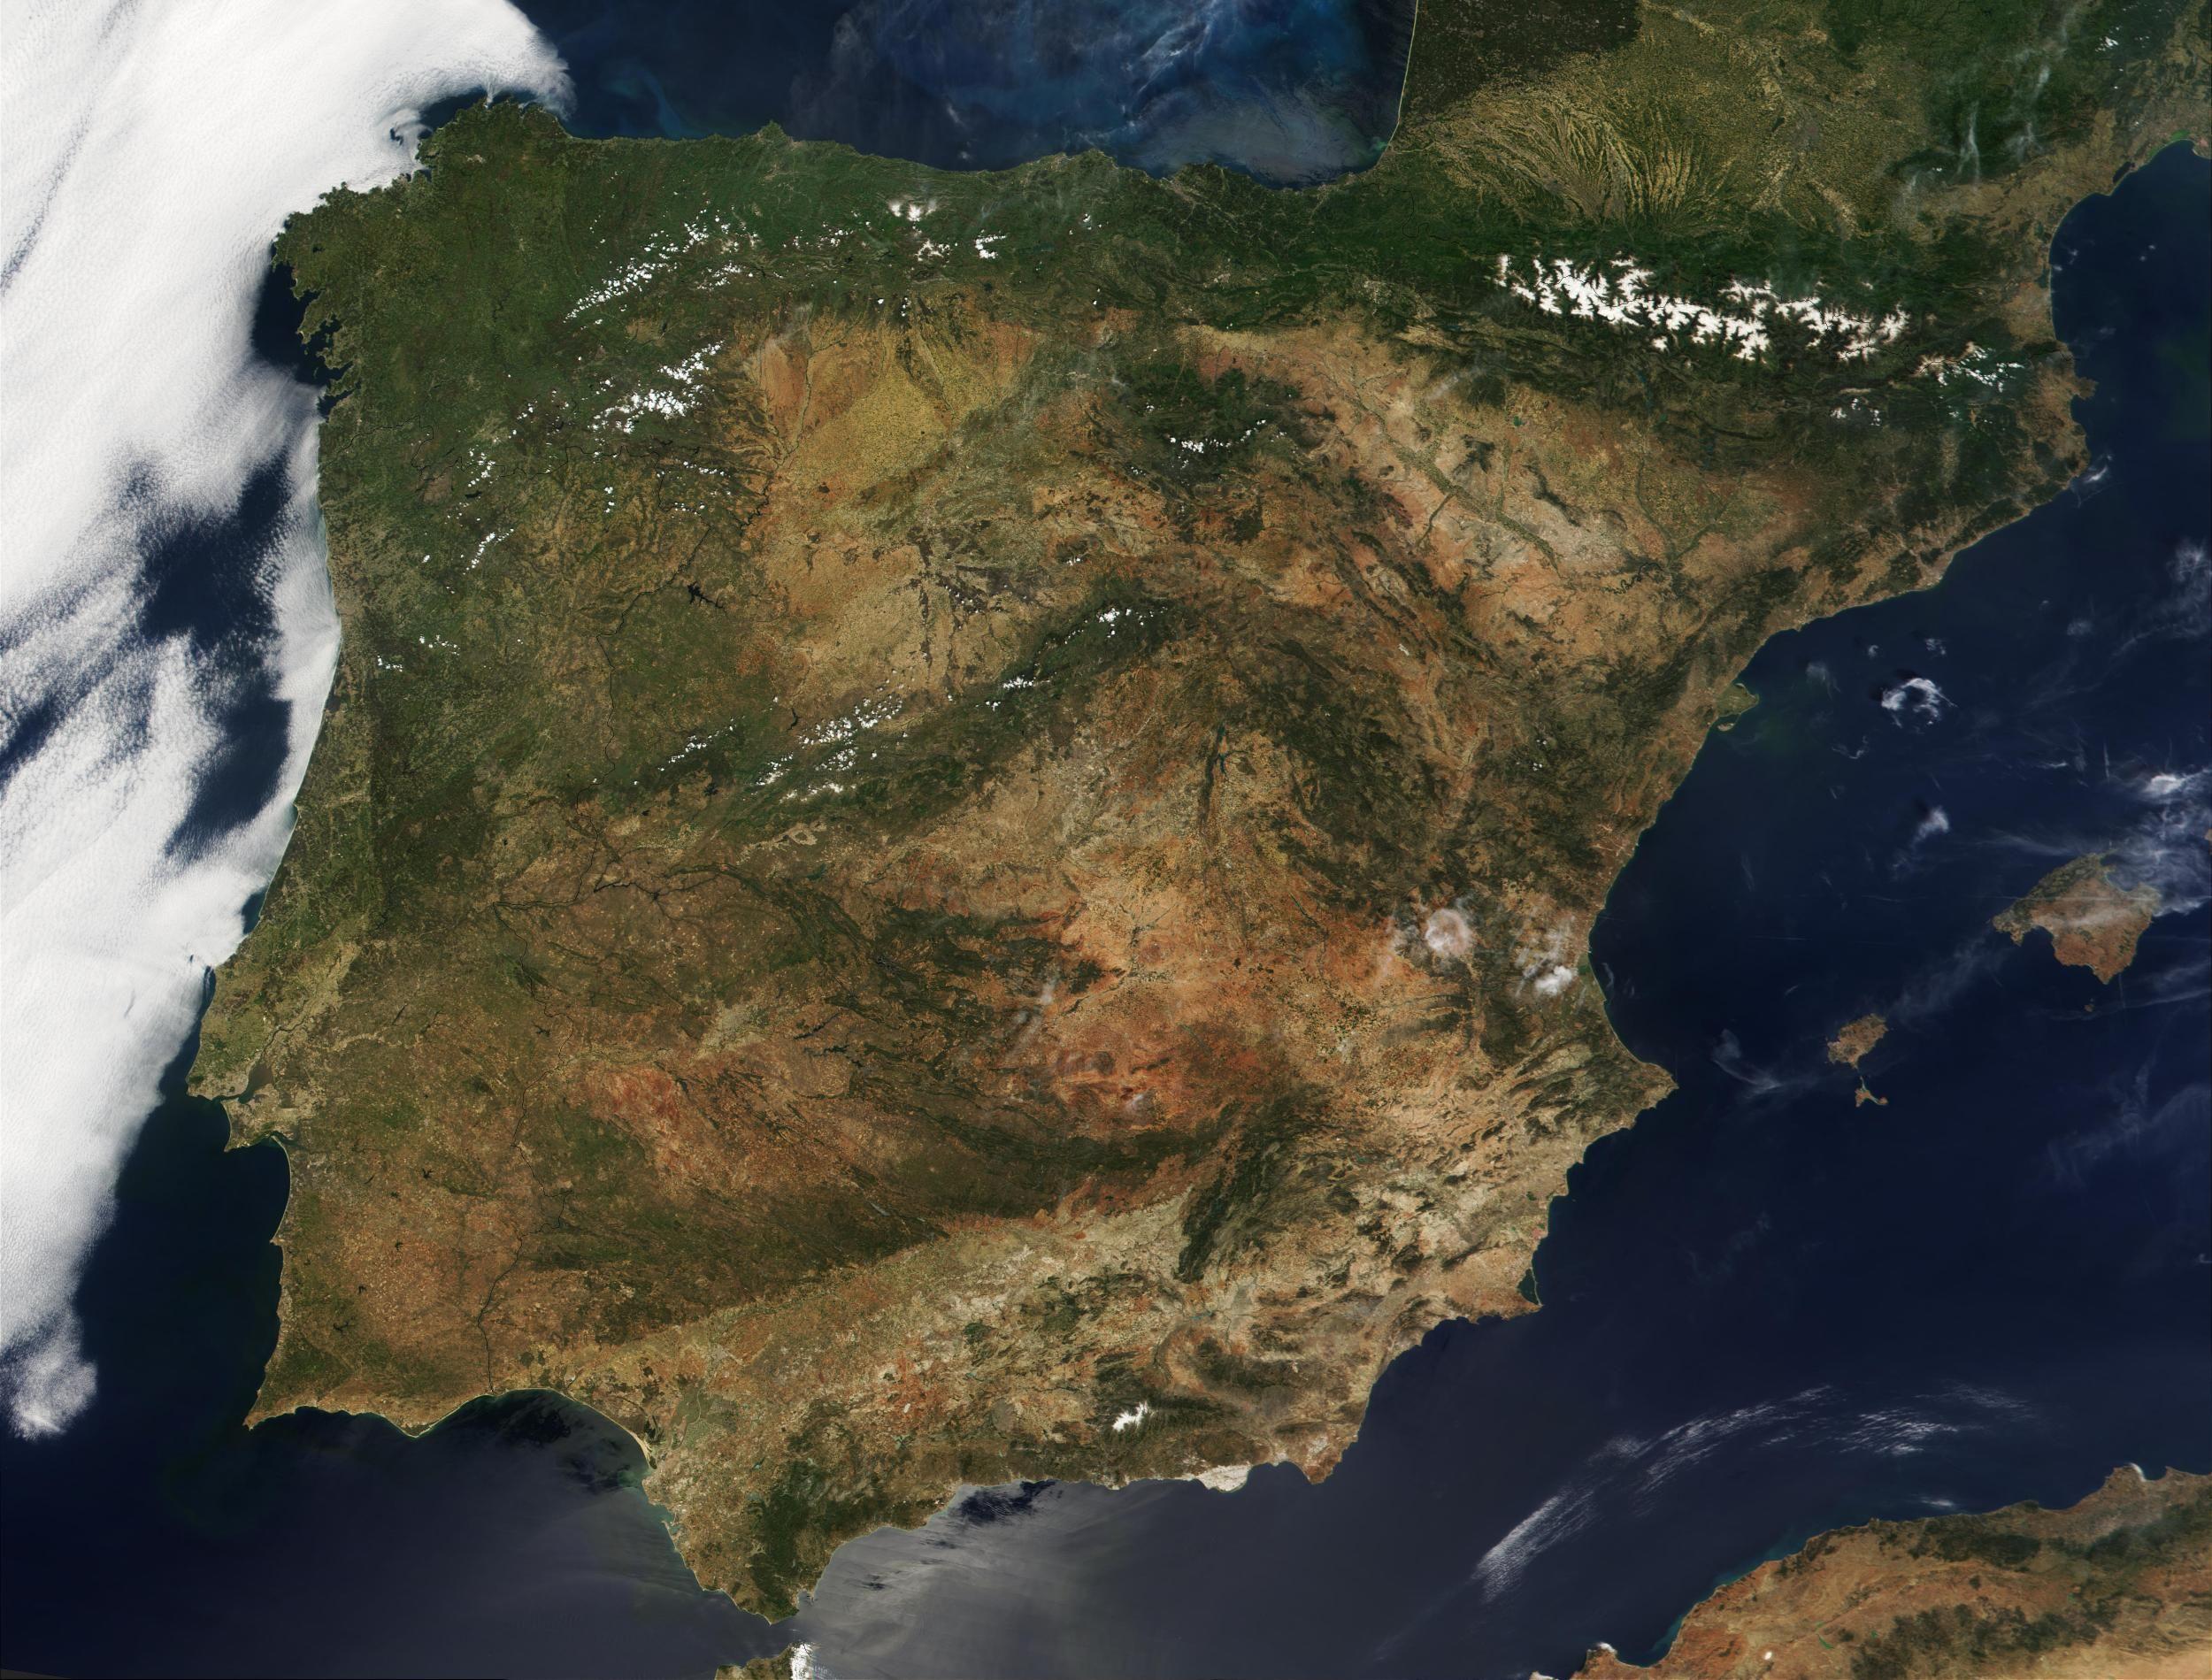 mapa de portugal visto por satelite Satellite Image, Photo of Portugal and Spain | CTF Space | Pinterest mapa de portugal visto por satelite